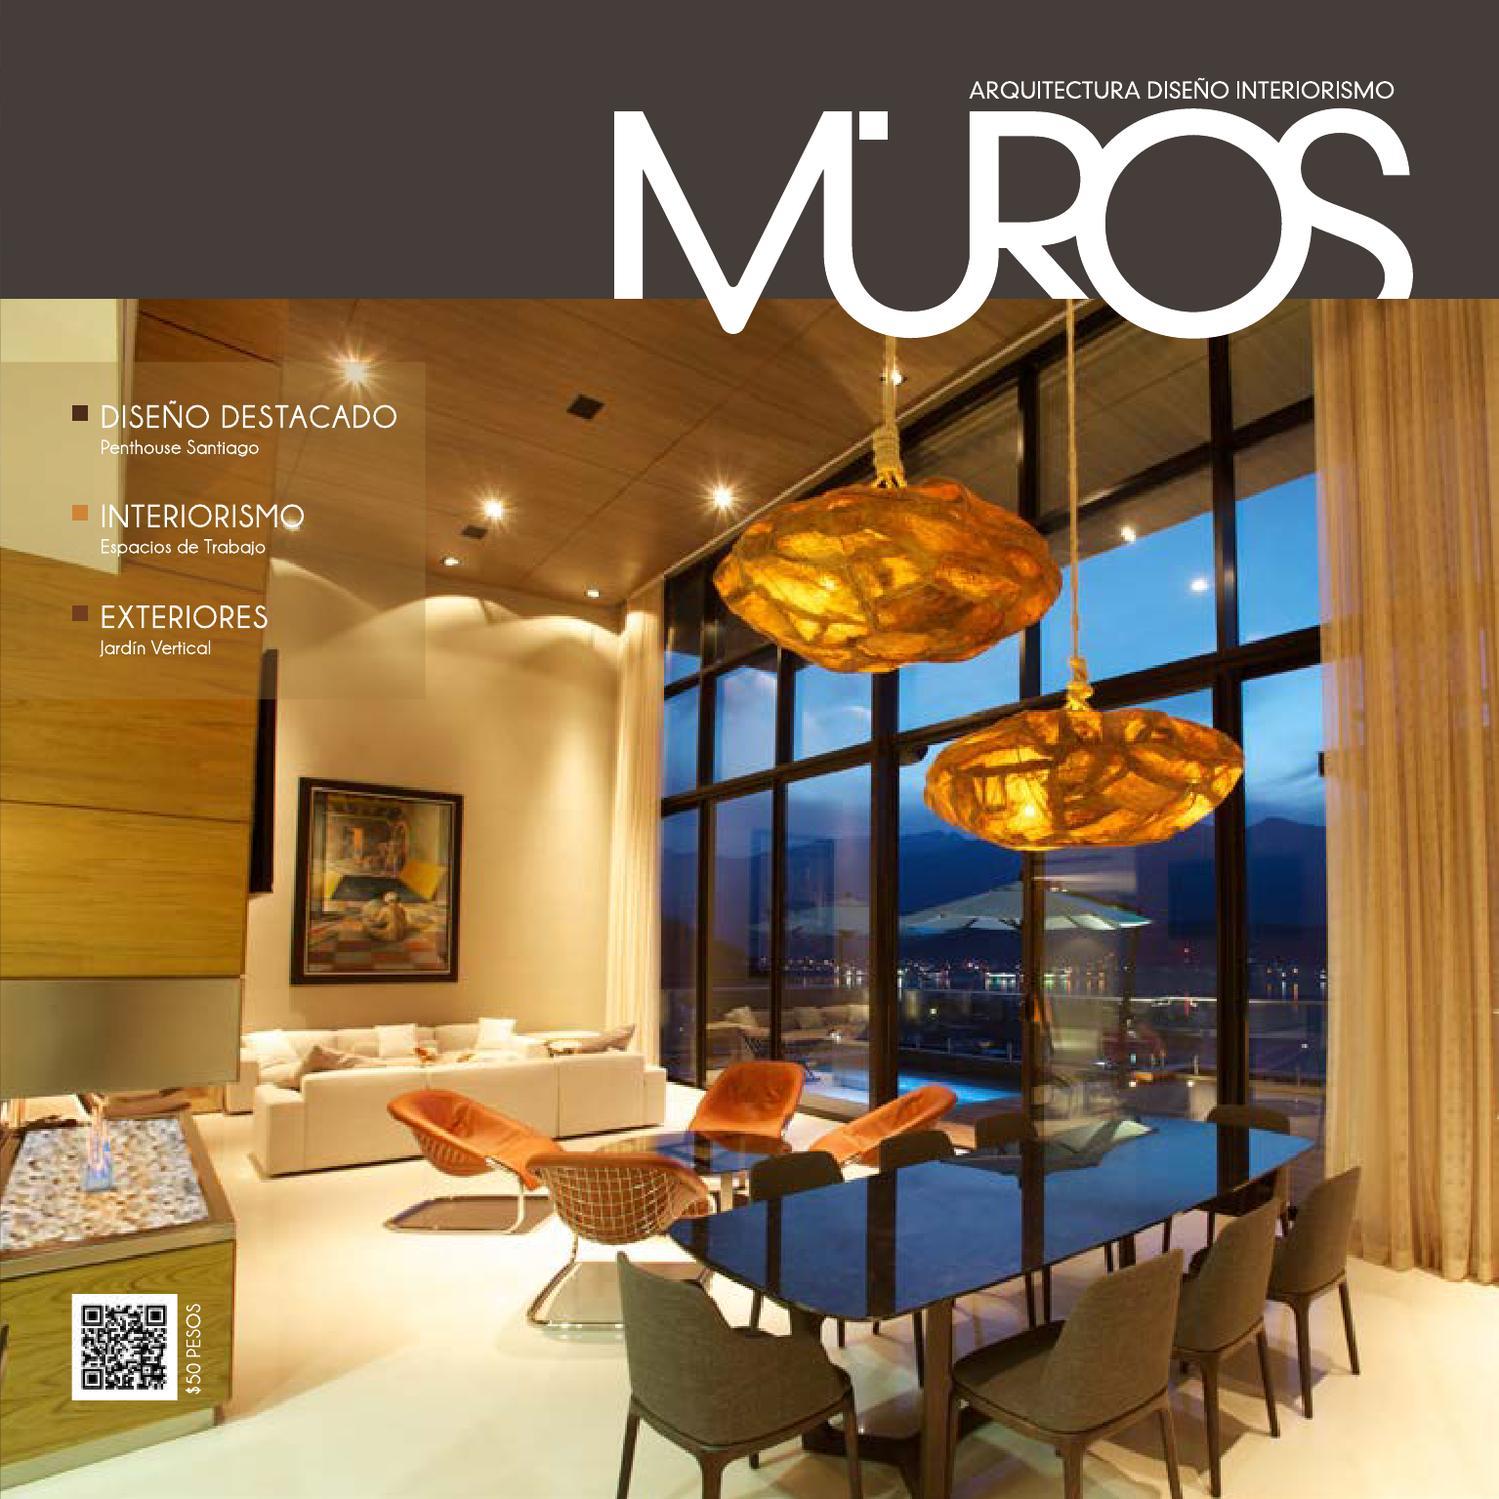 Edici n 0 revista muros arquitectura dise o interiorismo for Revista habitat arquitectura diseno interiorismo